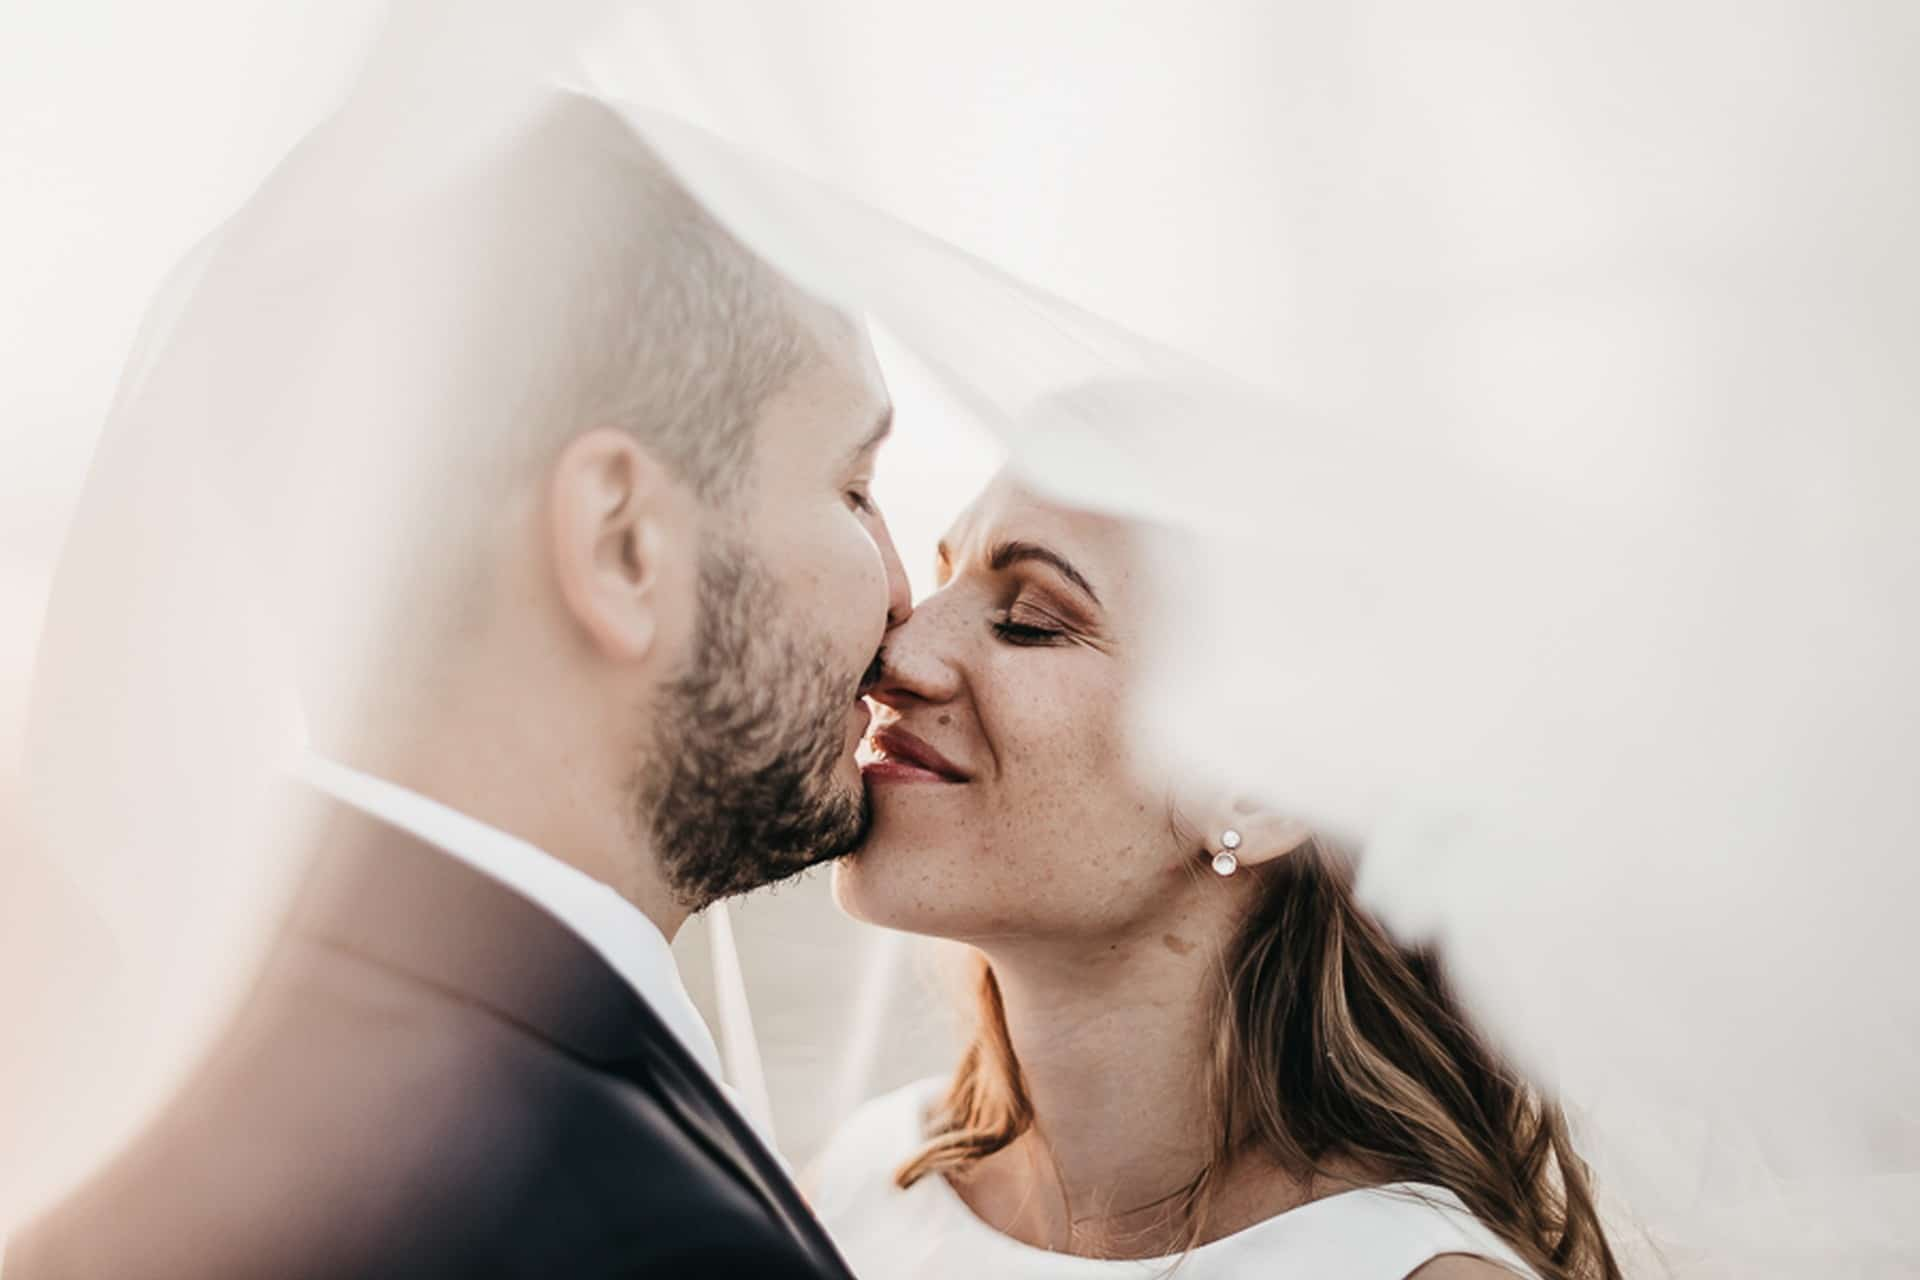 1302-Kat-Erdelyi-Hochzeitsfotografie-Hochzeitsfotos-5eeyKOE6